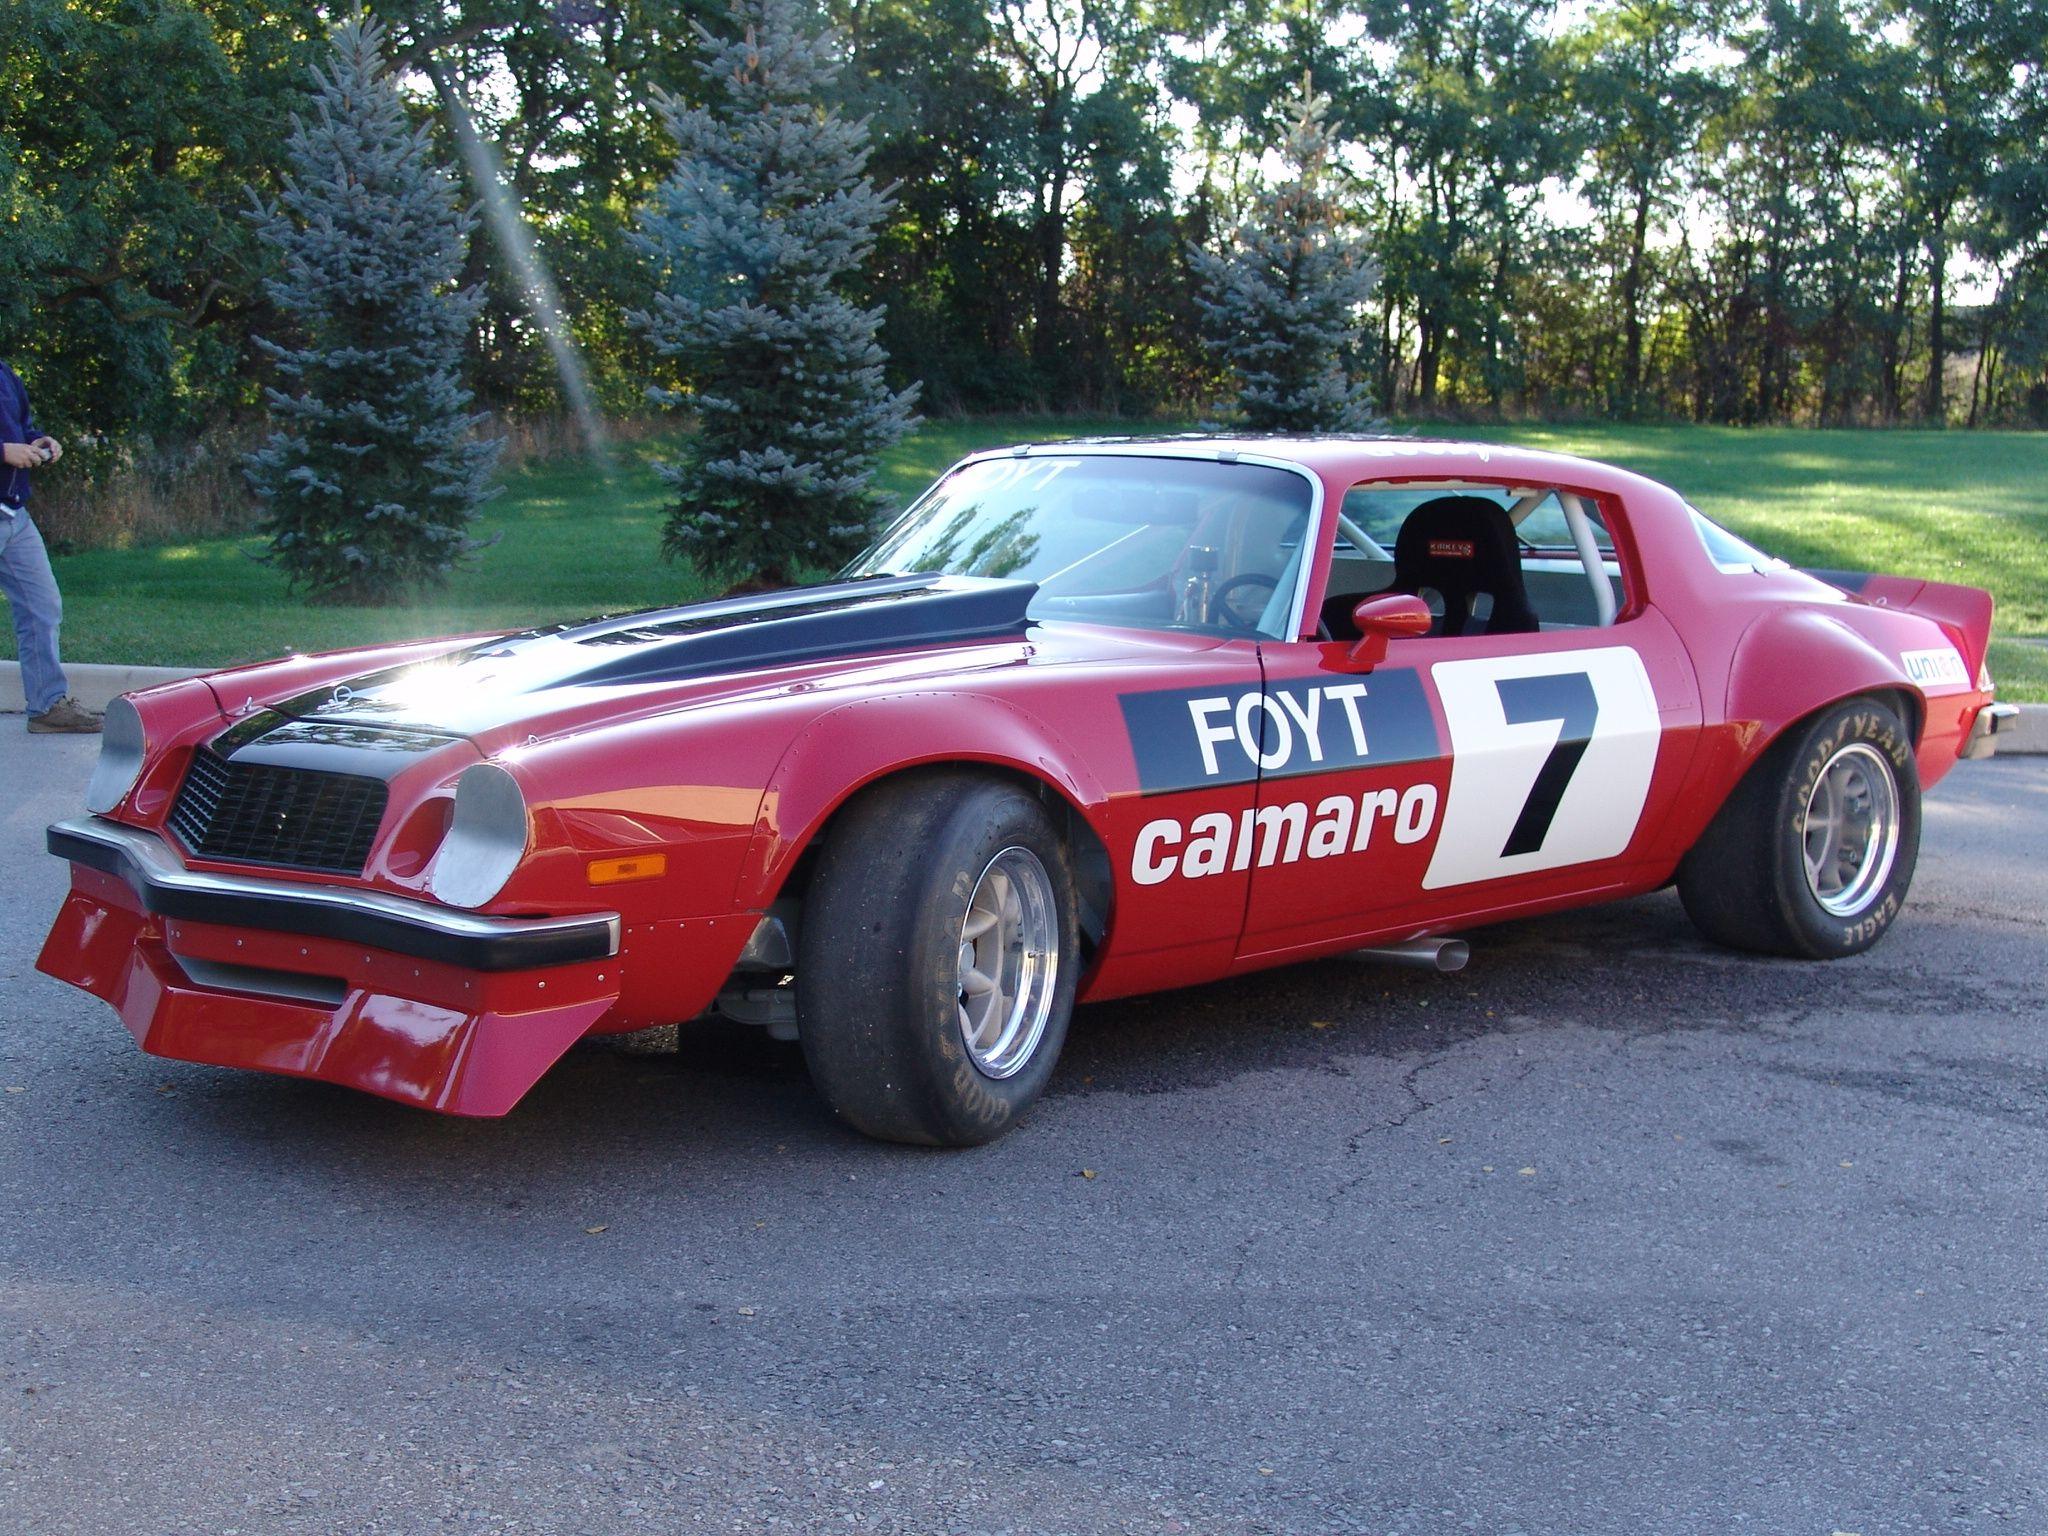 1975 Iroc Camaro Race Car For Sale Camaro Camaro Iroc Race Cars